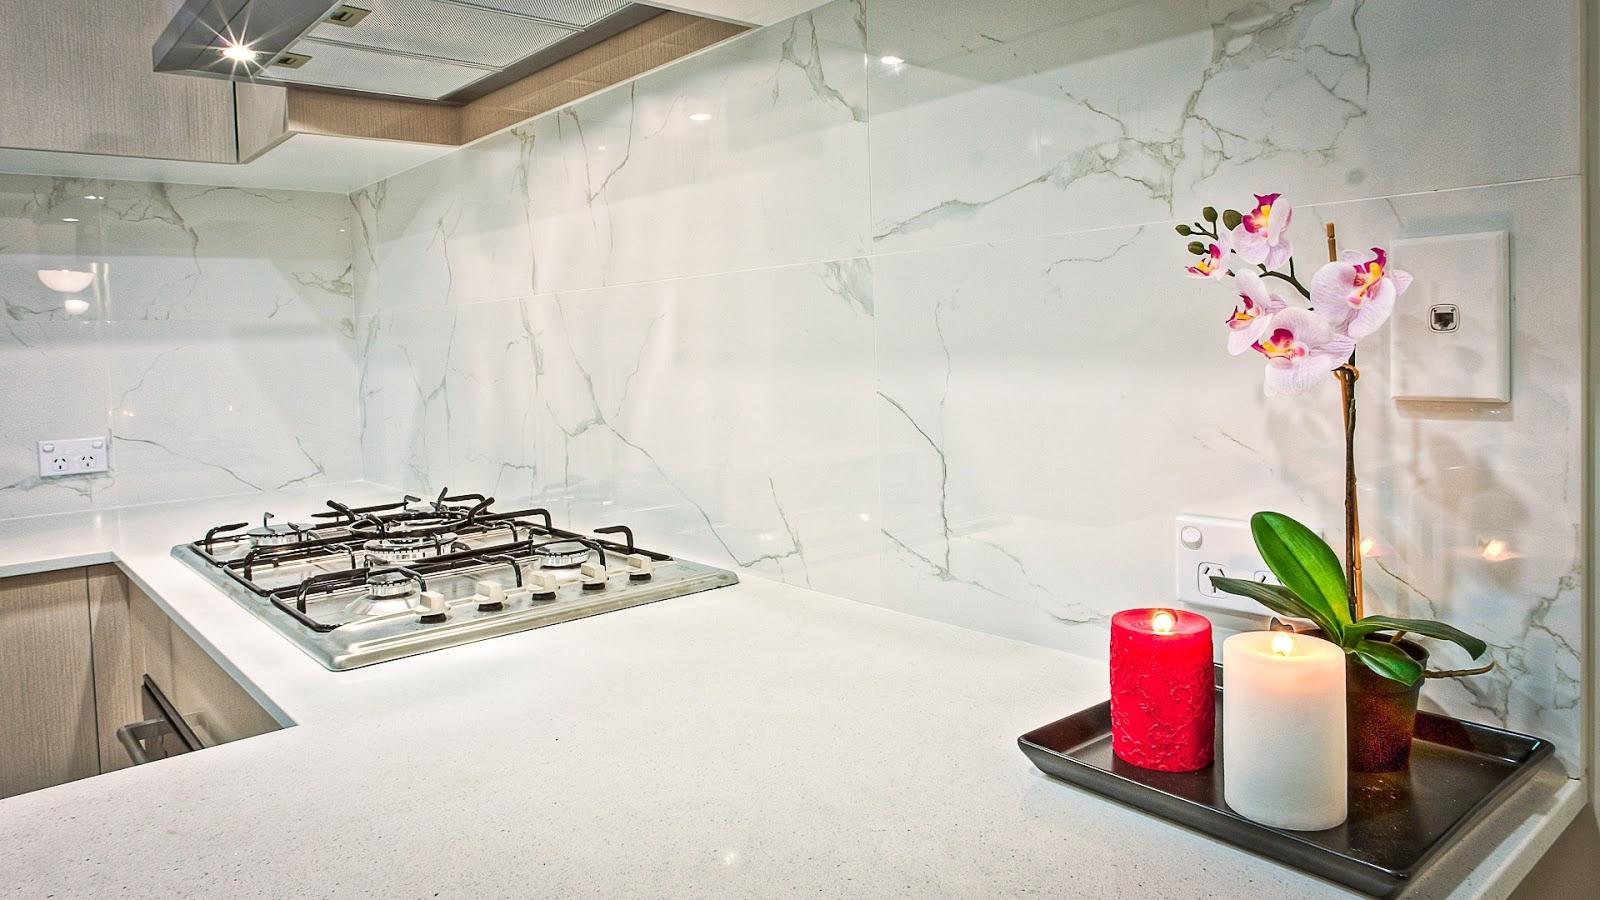 Kitchen Backsplash Ideas for Your Kitchen Renovation